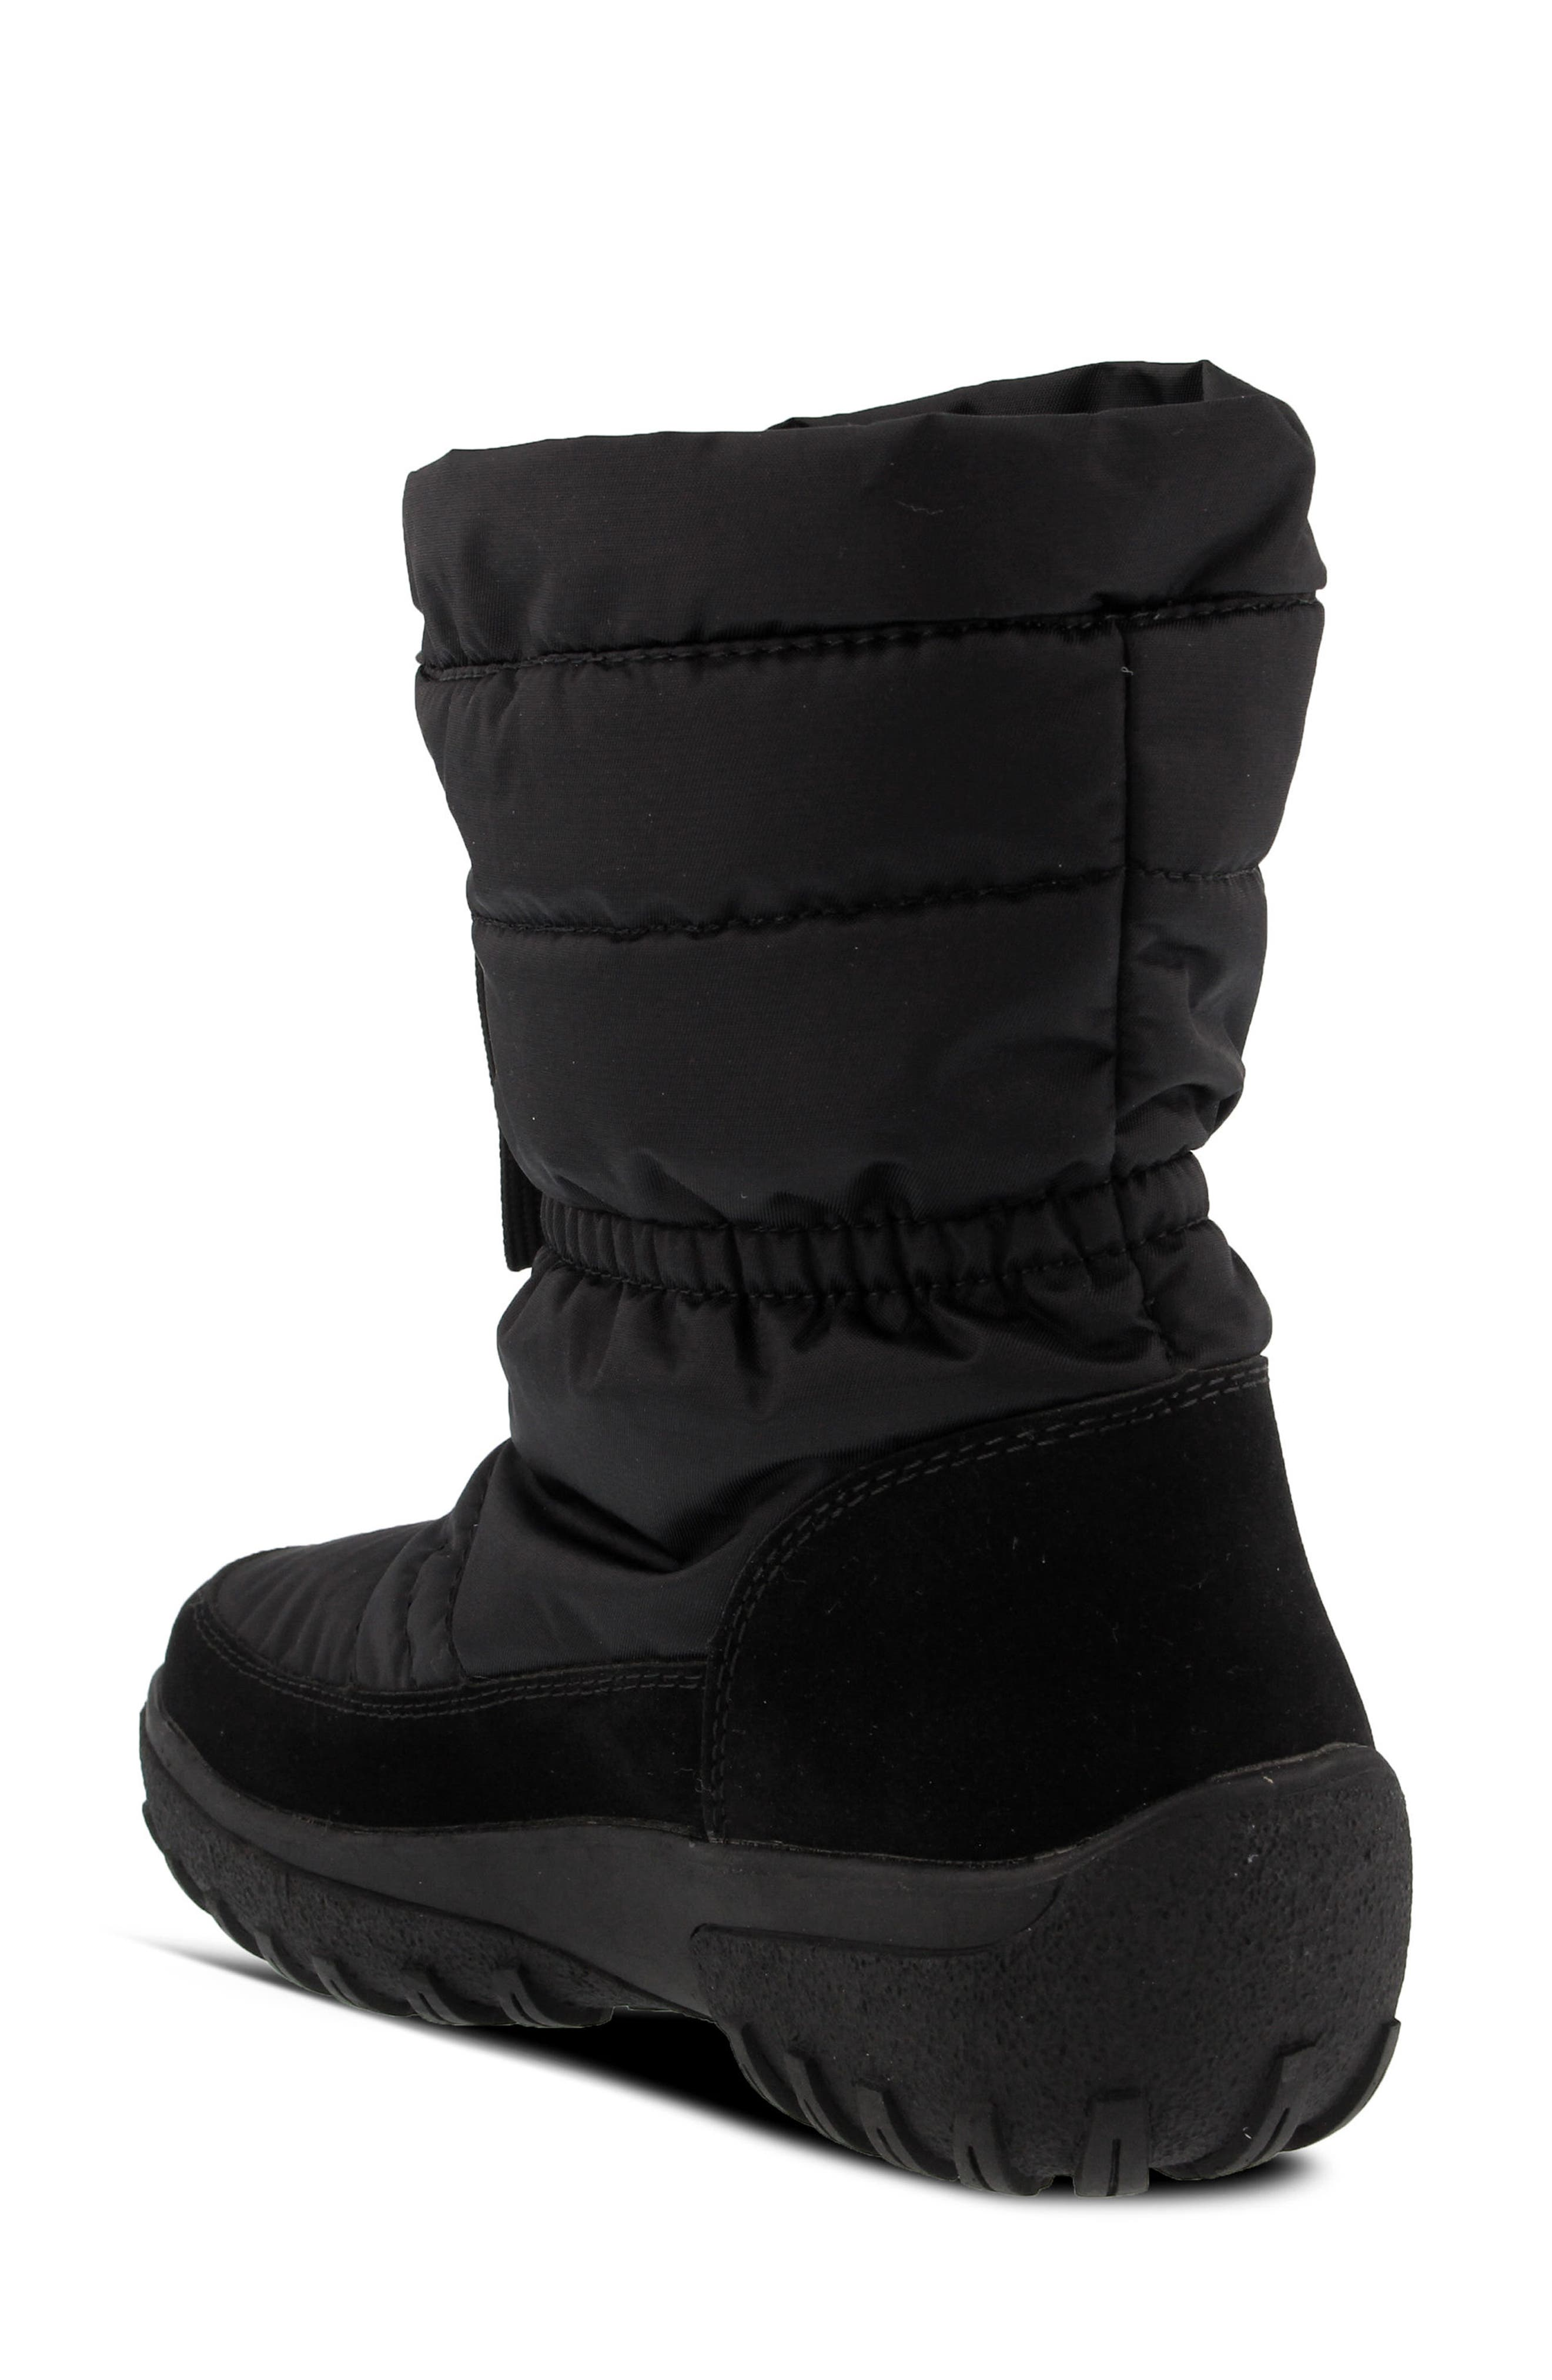 Lucerne Waterproof Drawstring Boot,                             Alternate thumbnail 2, color,                             Black